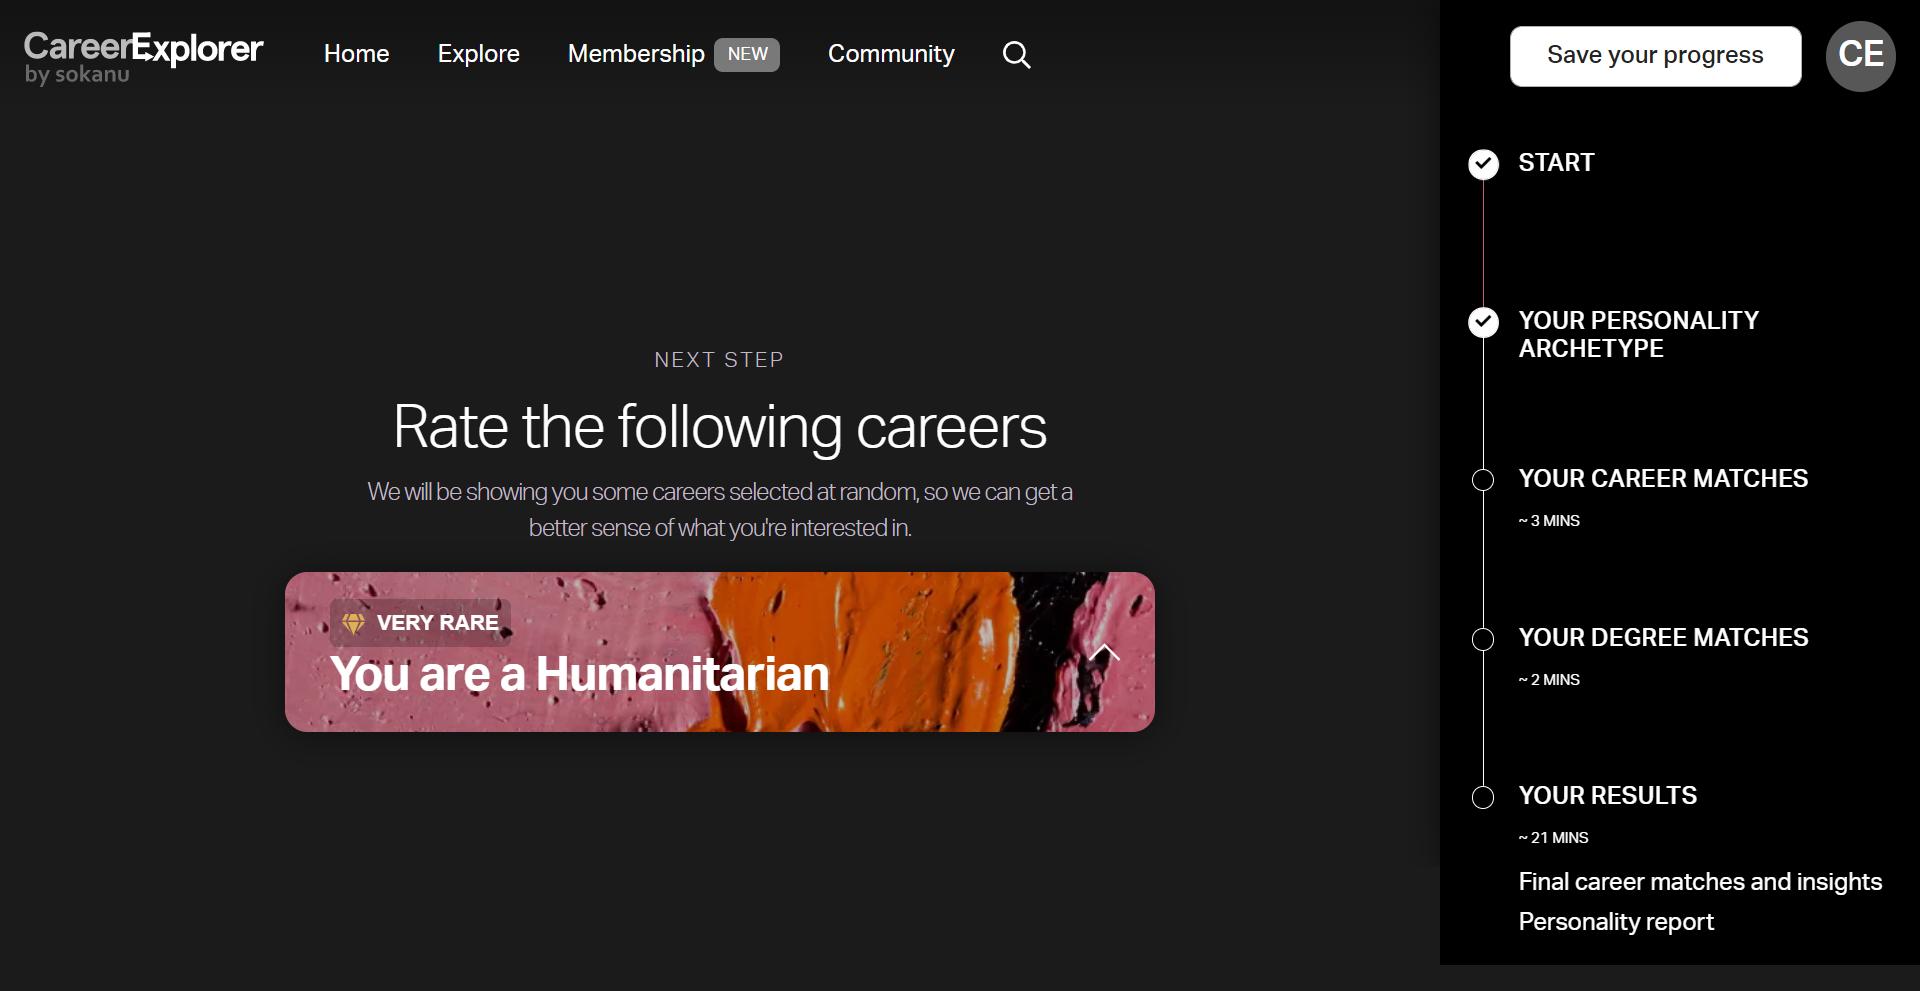 screencapture-careerexplorer-assessments-welcome-2020-11-08-15_41_41